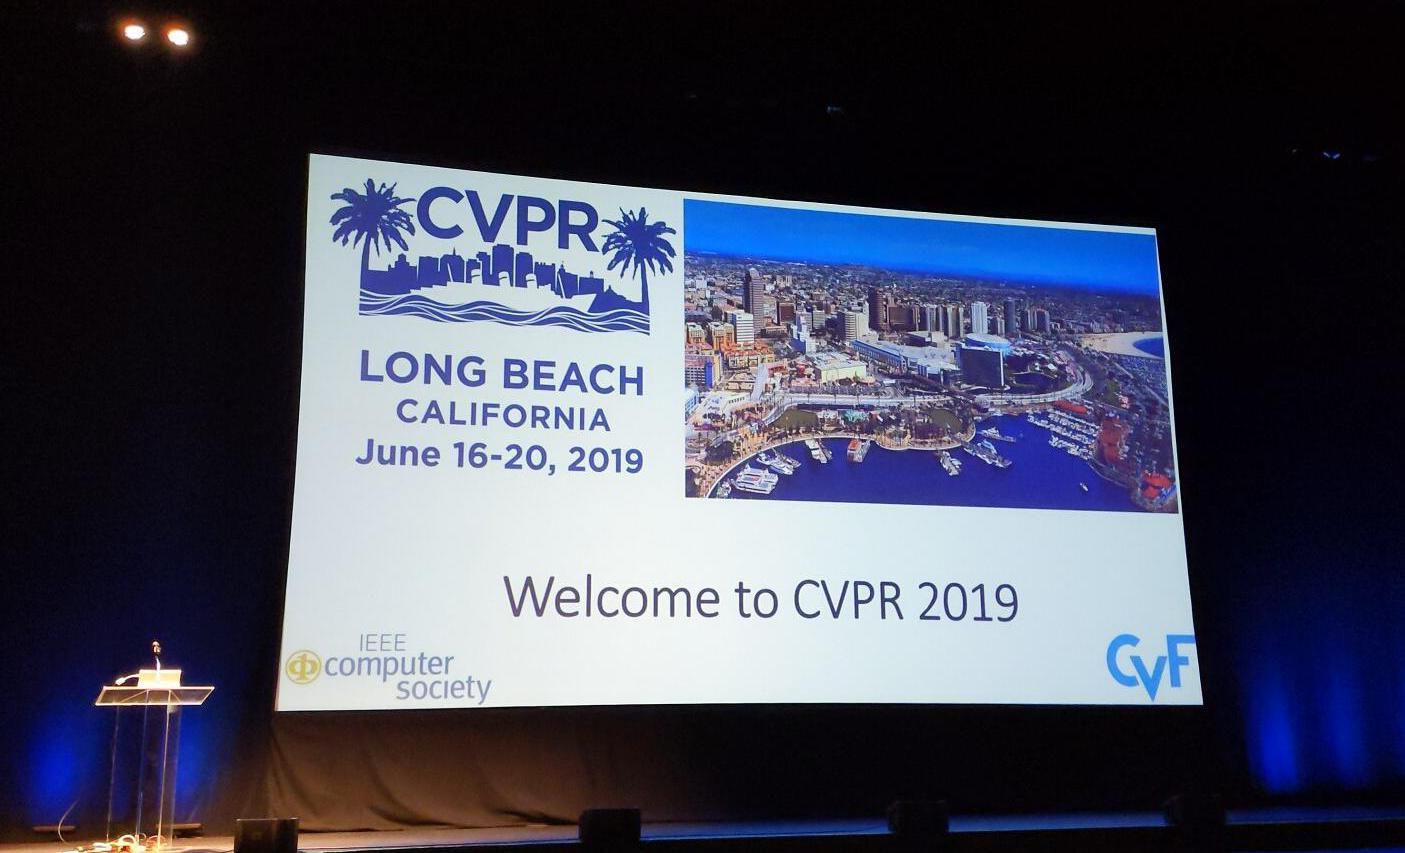 CVPR 2019 Attracts 9K Attendees